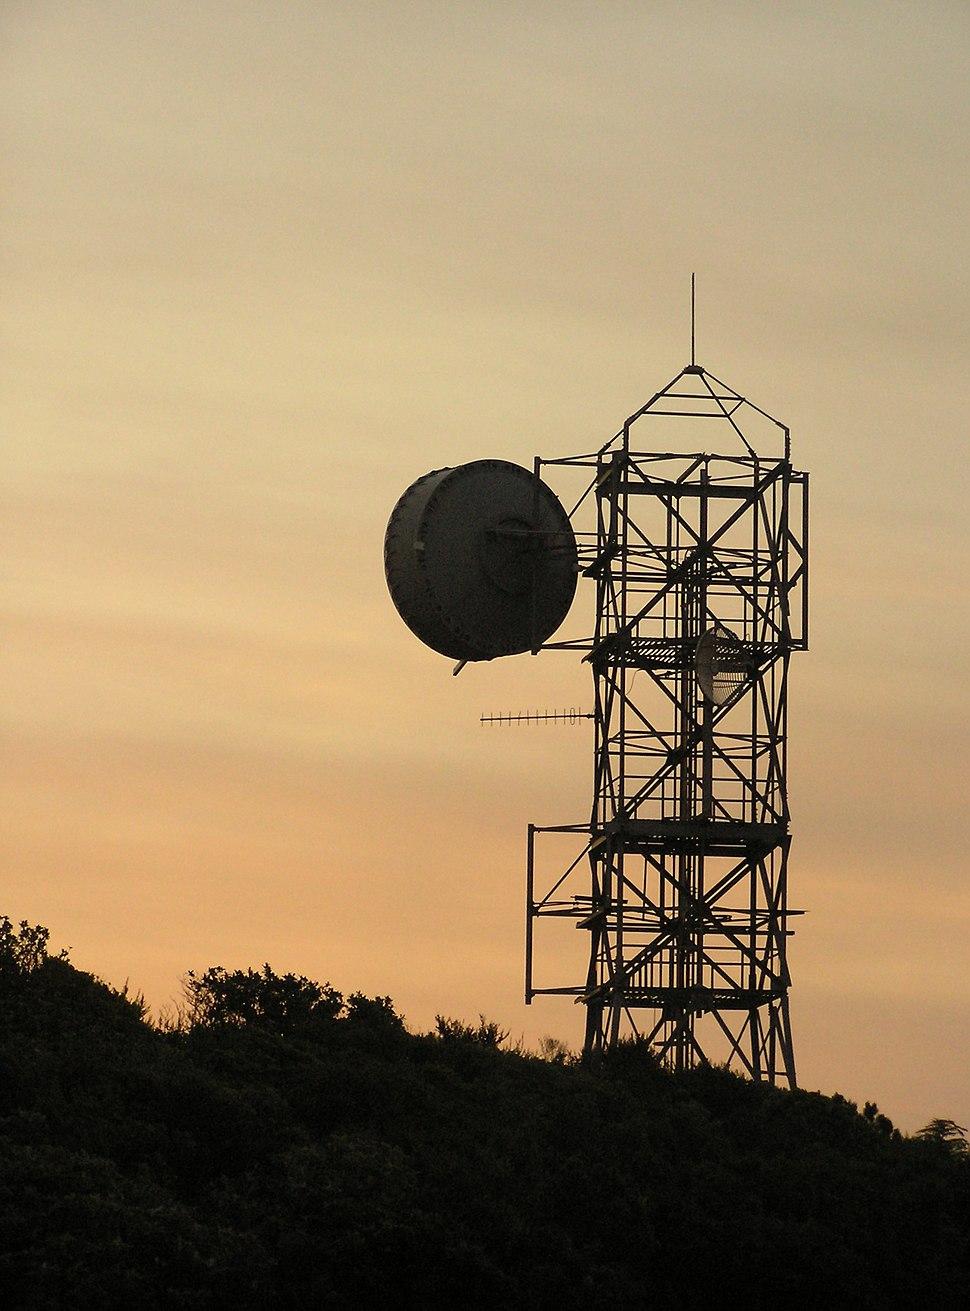 Microwave tower silhouette